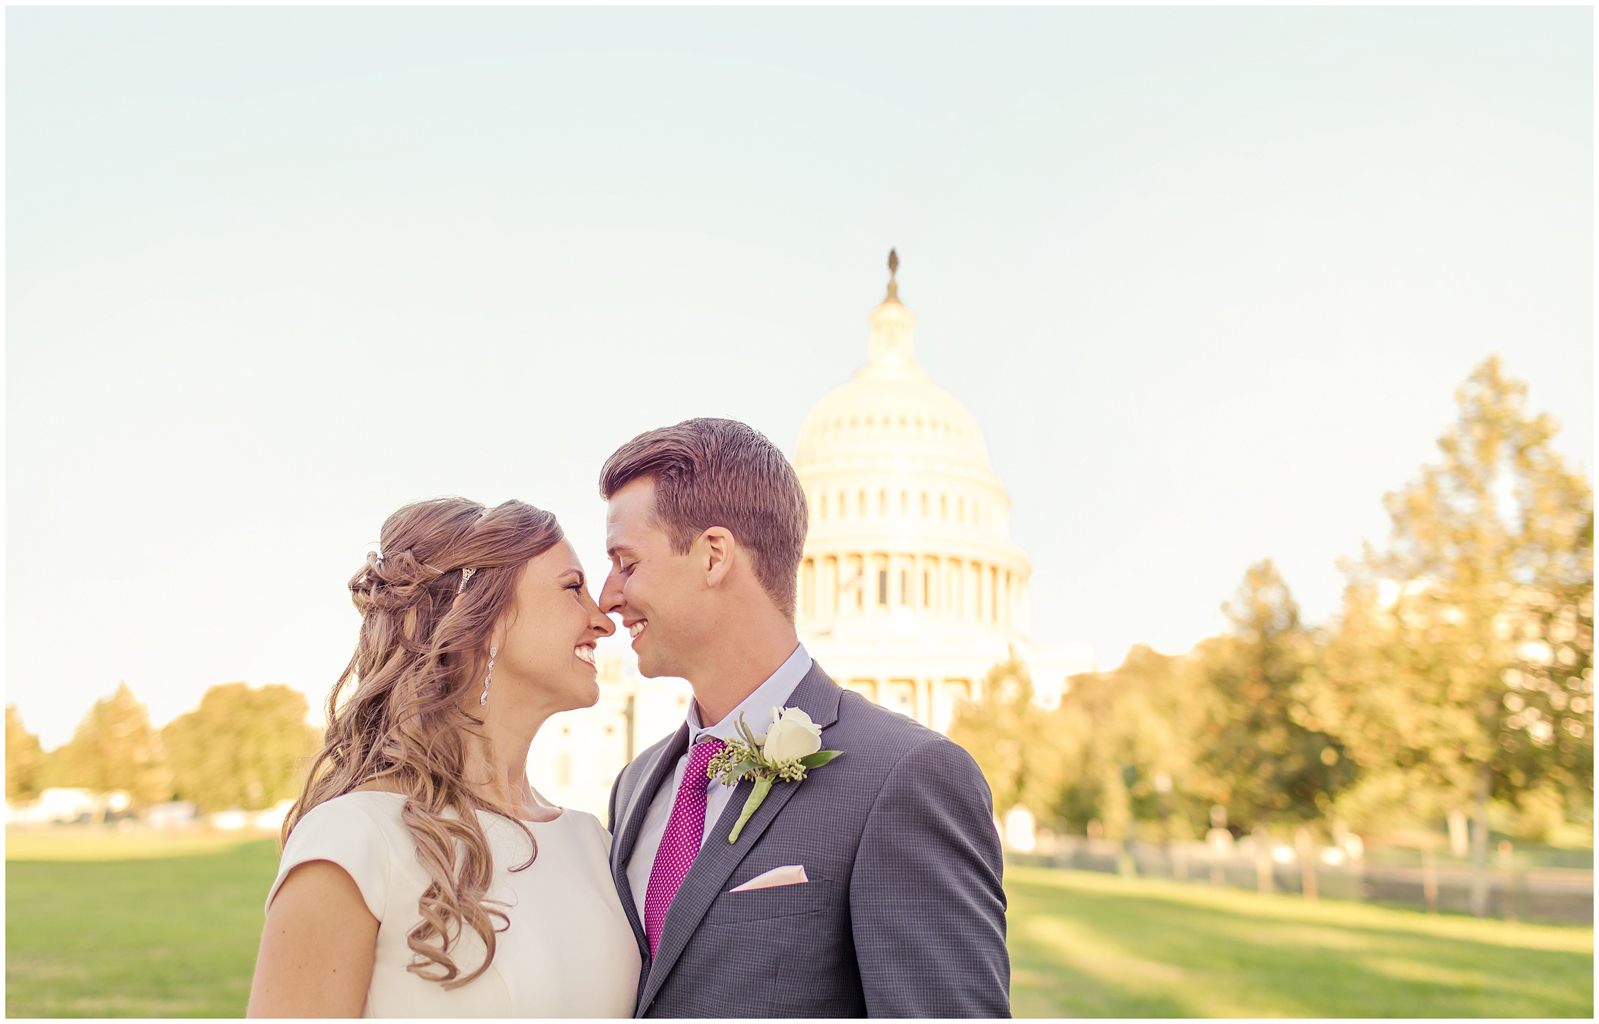 ritz-carlton-georgetown-wedding-washington-dc-photography-liz-stewart-photo-00035